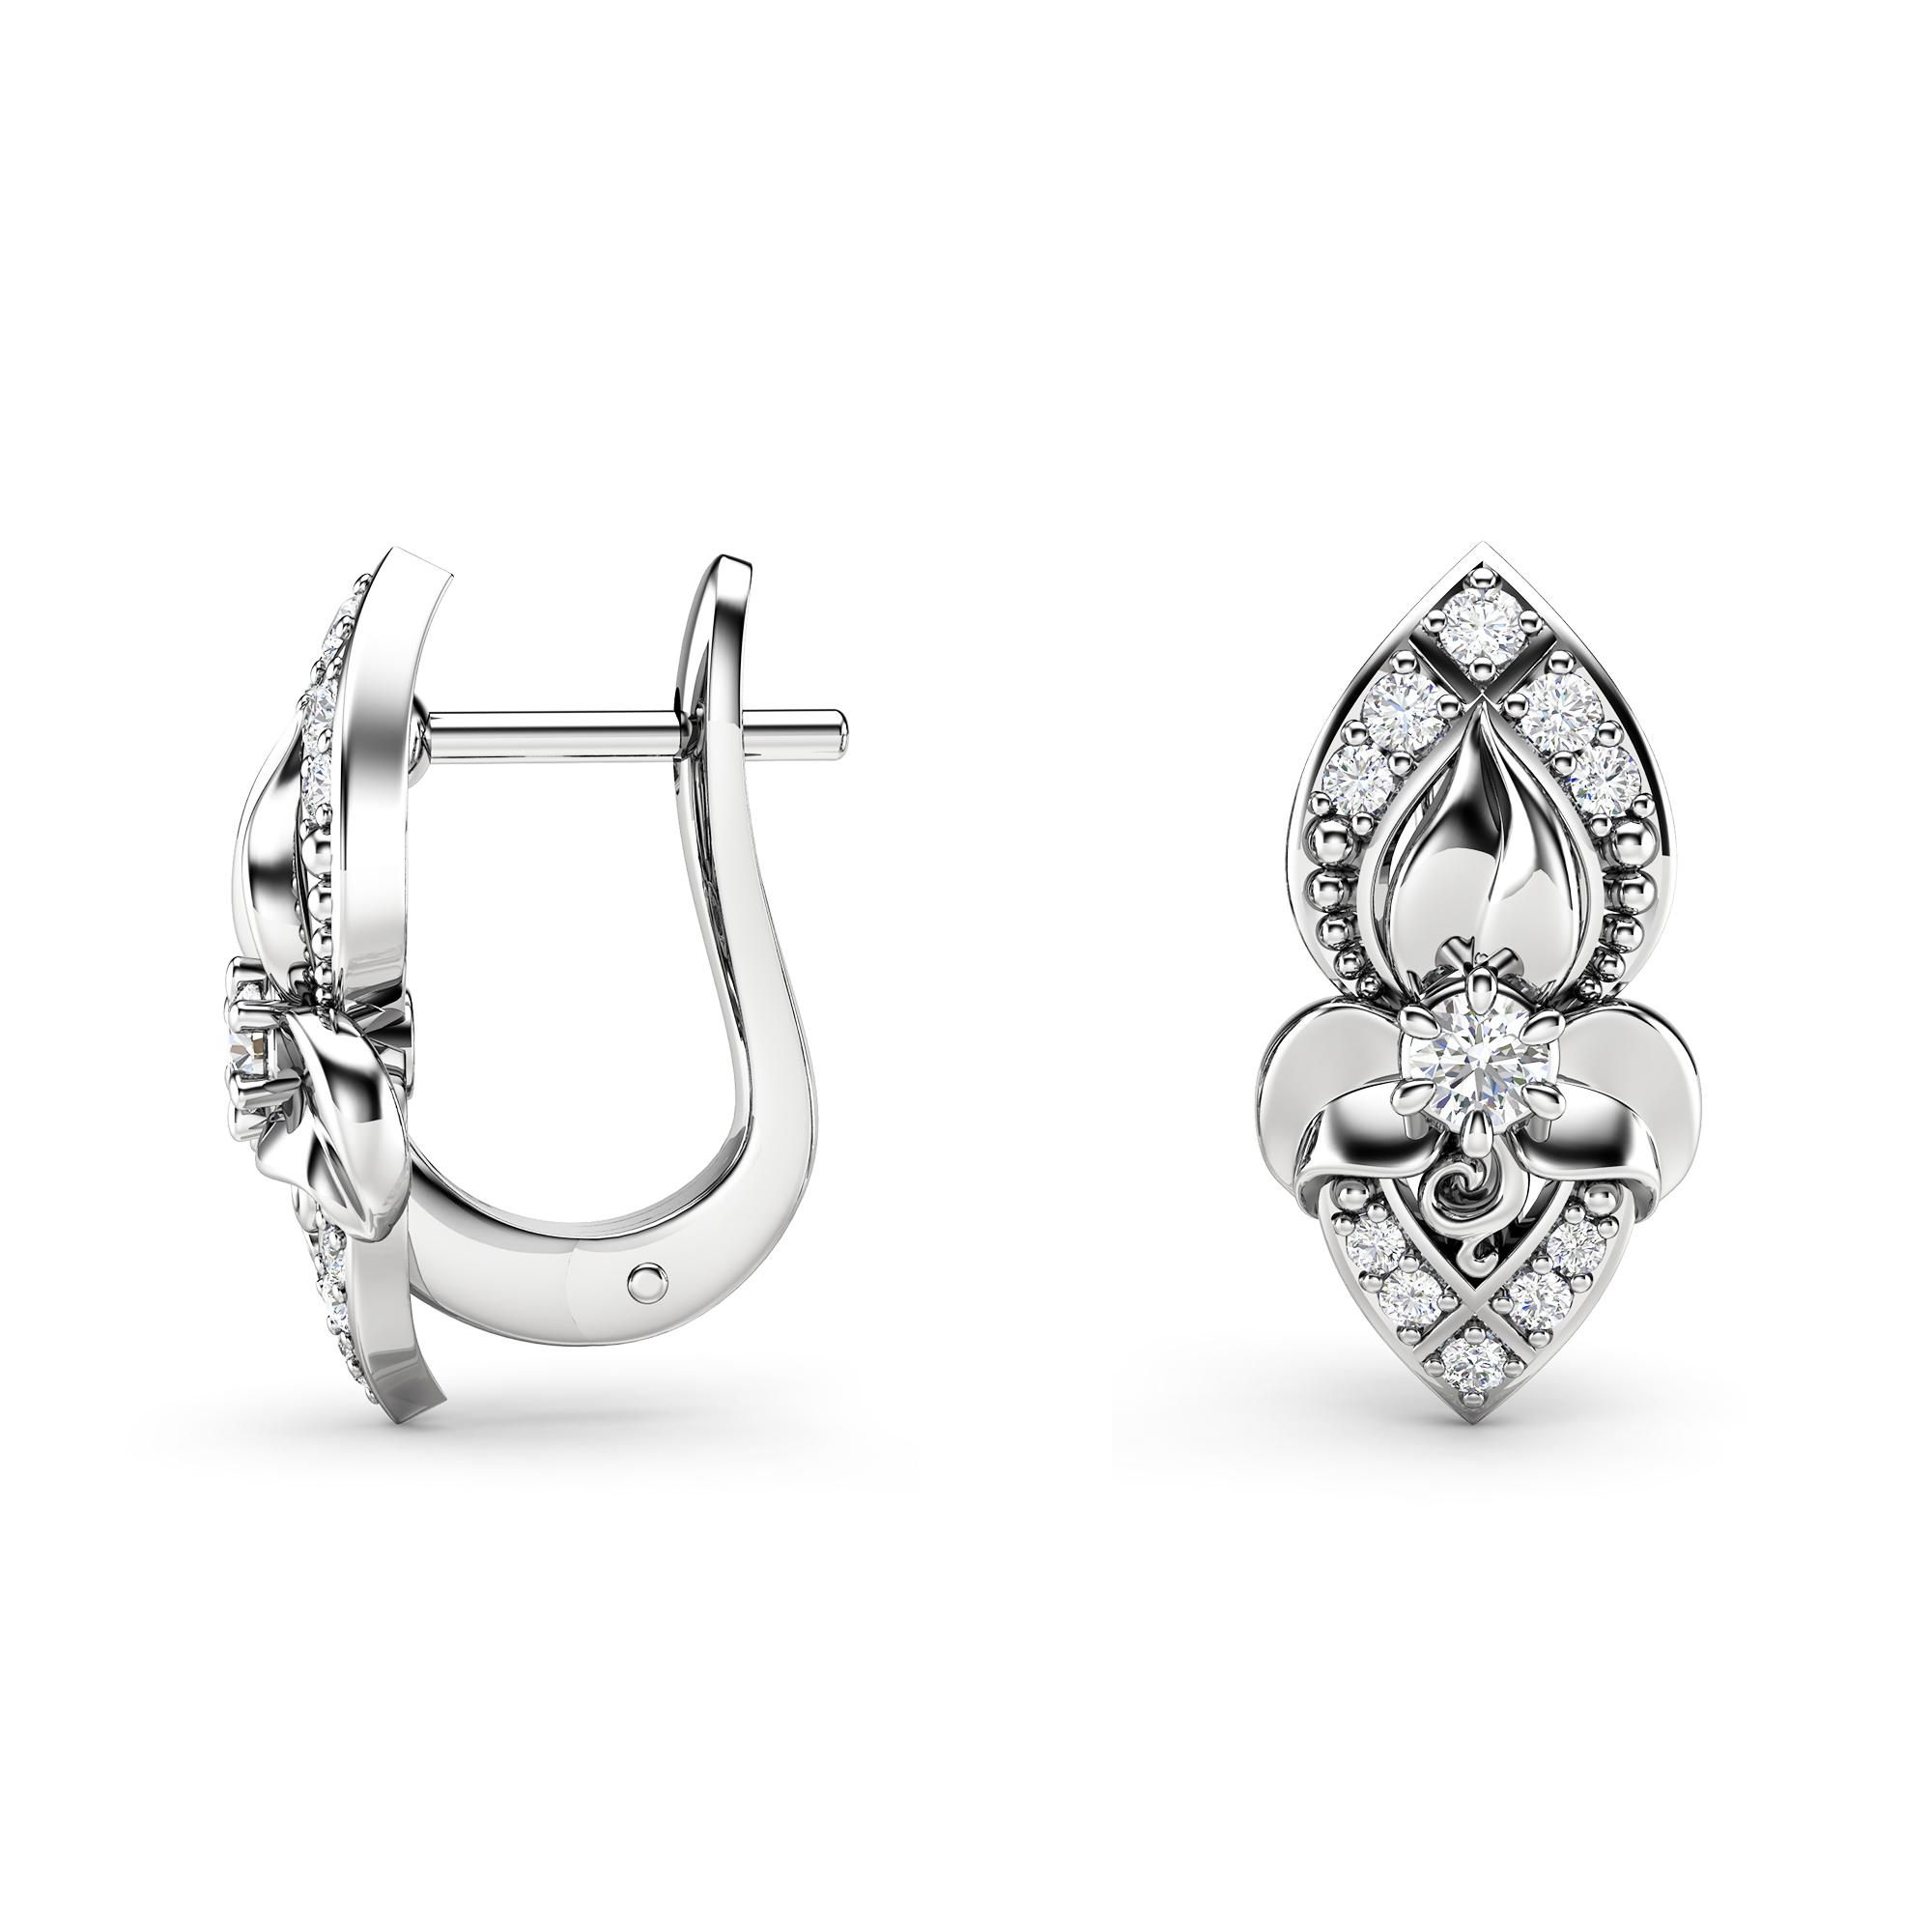 Natural Diamonds Earrings Gold Earrings Huggy Earrings Leaf Earrings Art Nouveau Diamonds Earrings